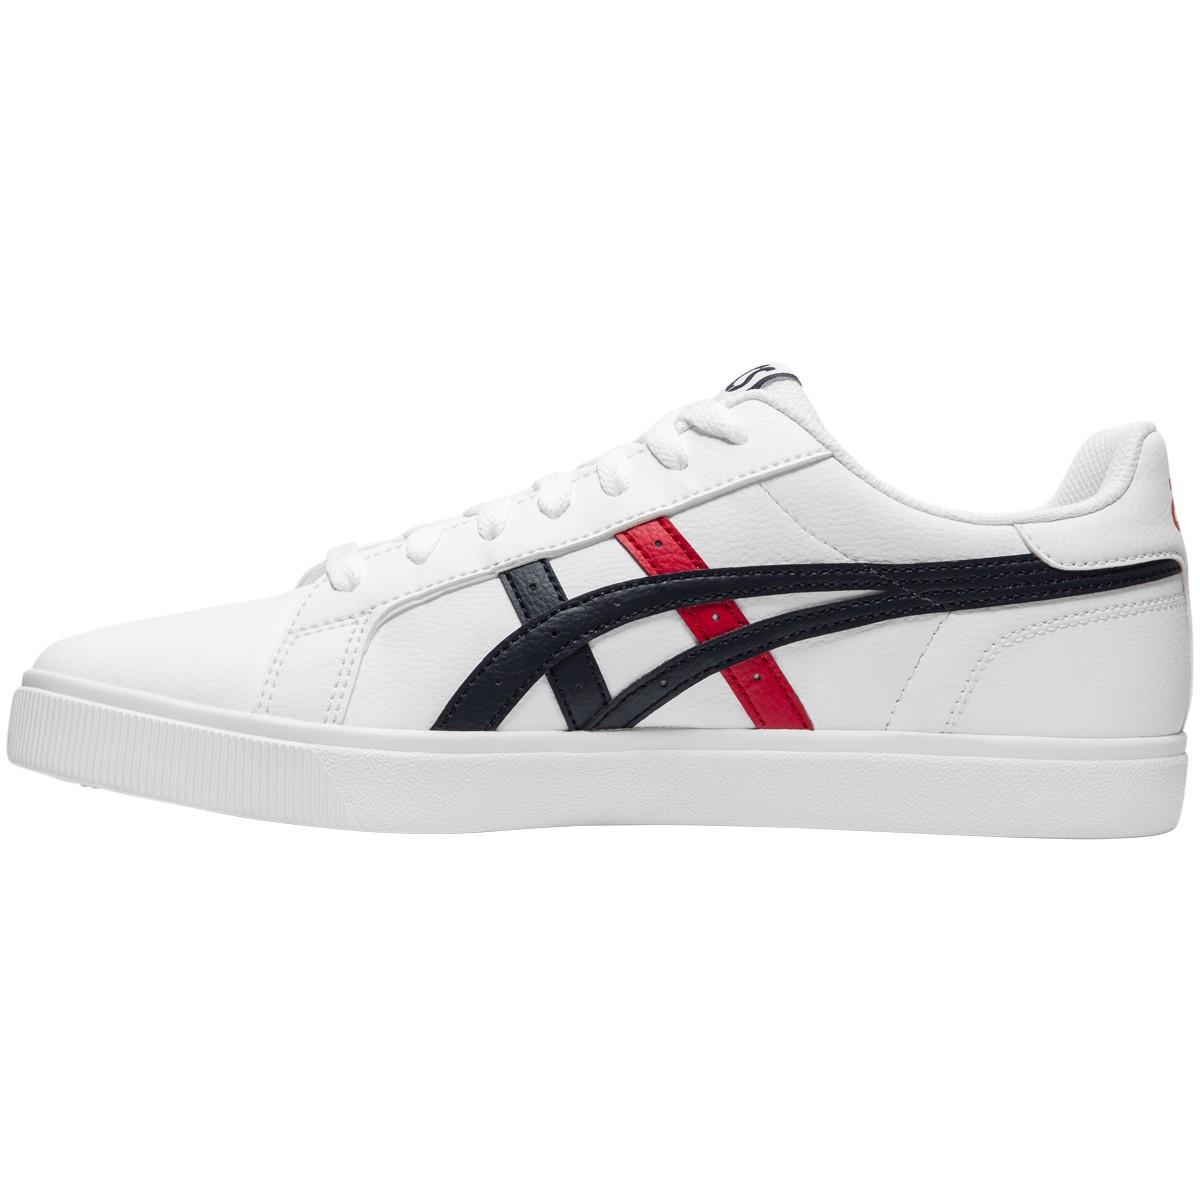 ASICS CLASSIC CT SHOES - ASICS - Men's - Shoes   Tennispro